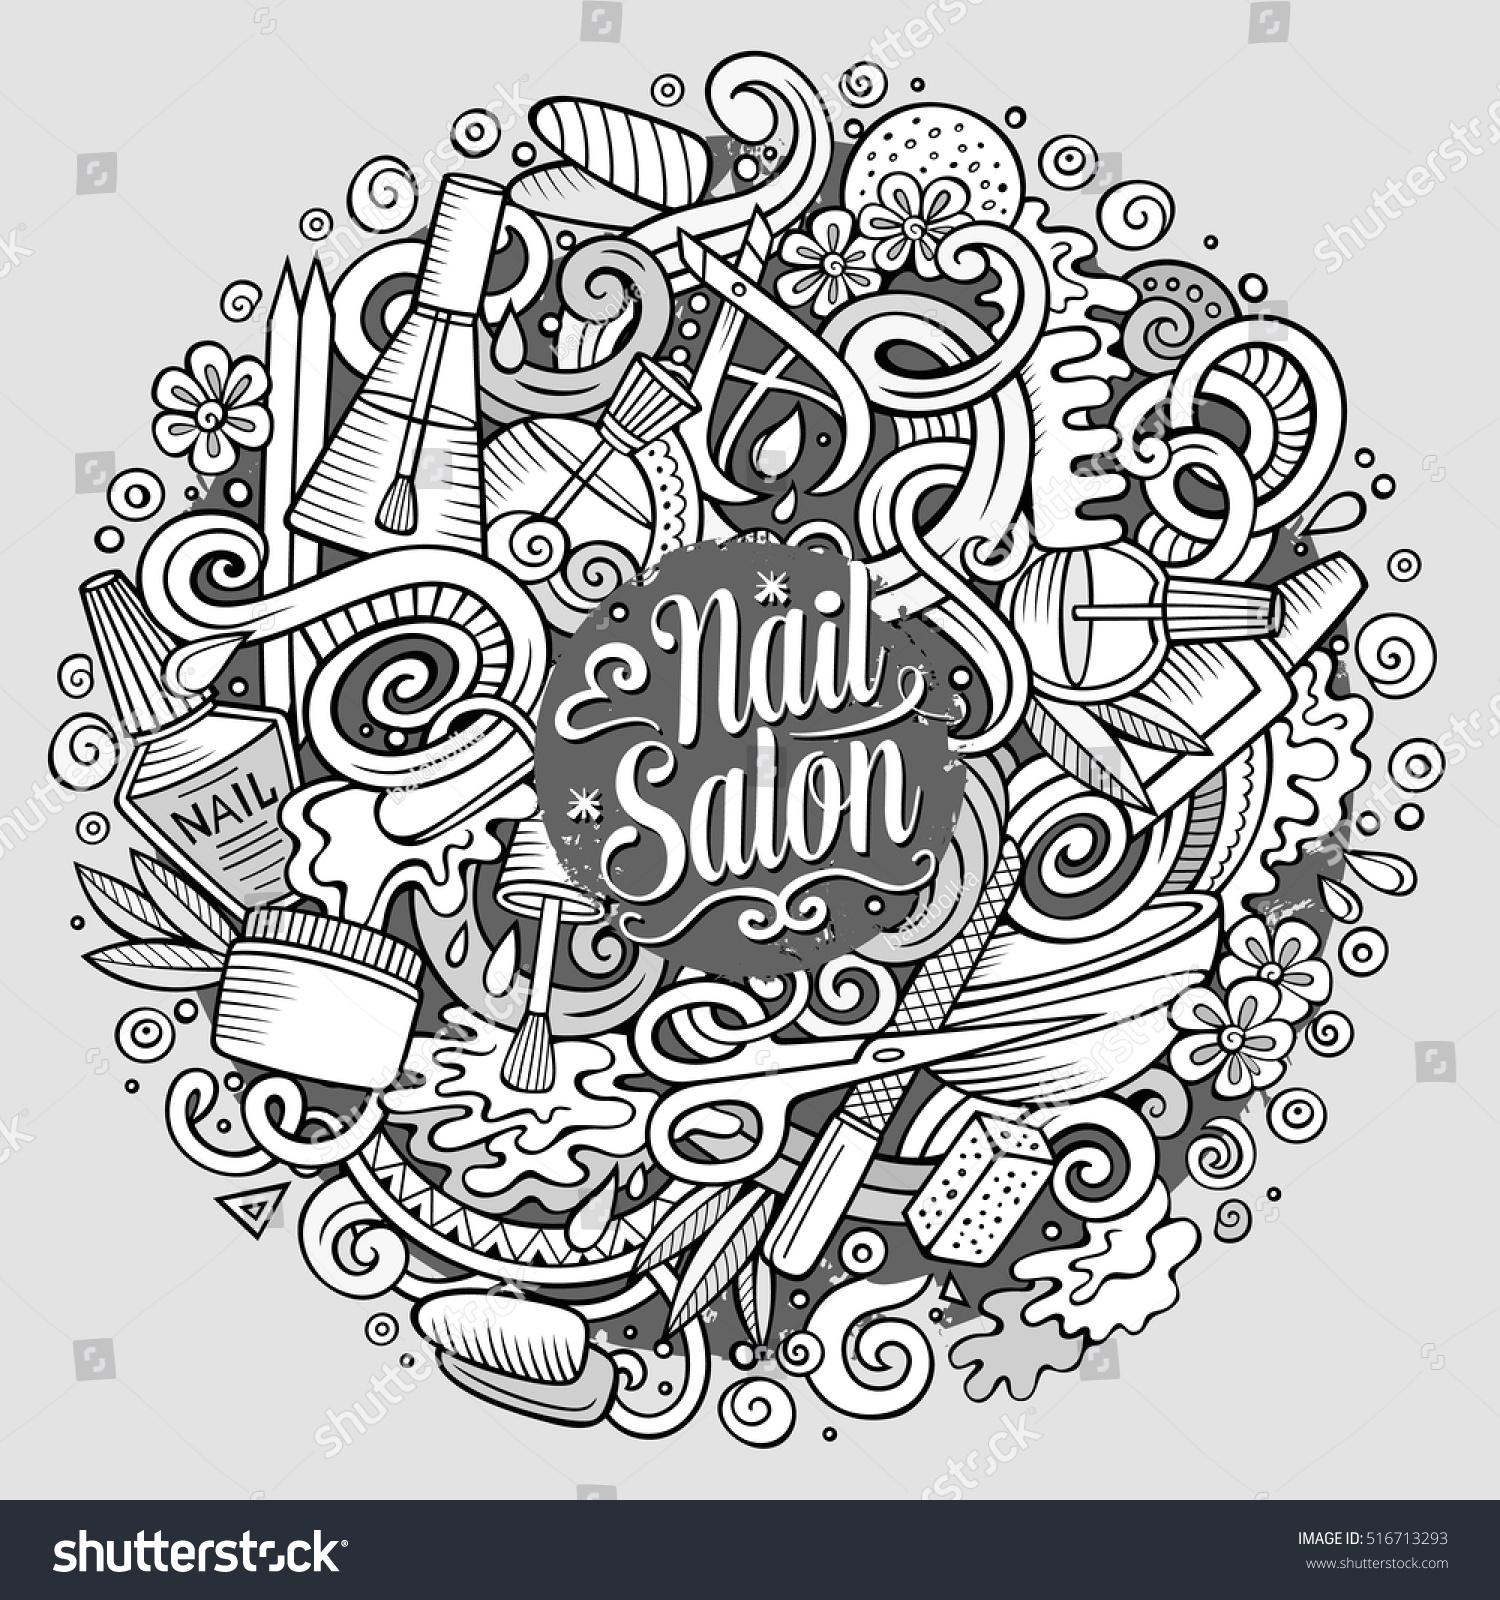 Cartoon Cute Doodles Hand Drawn Nail Stock Vector 516713293 ...